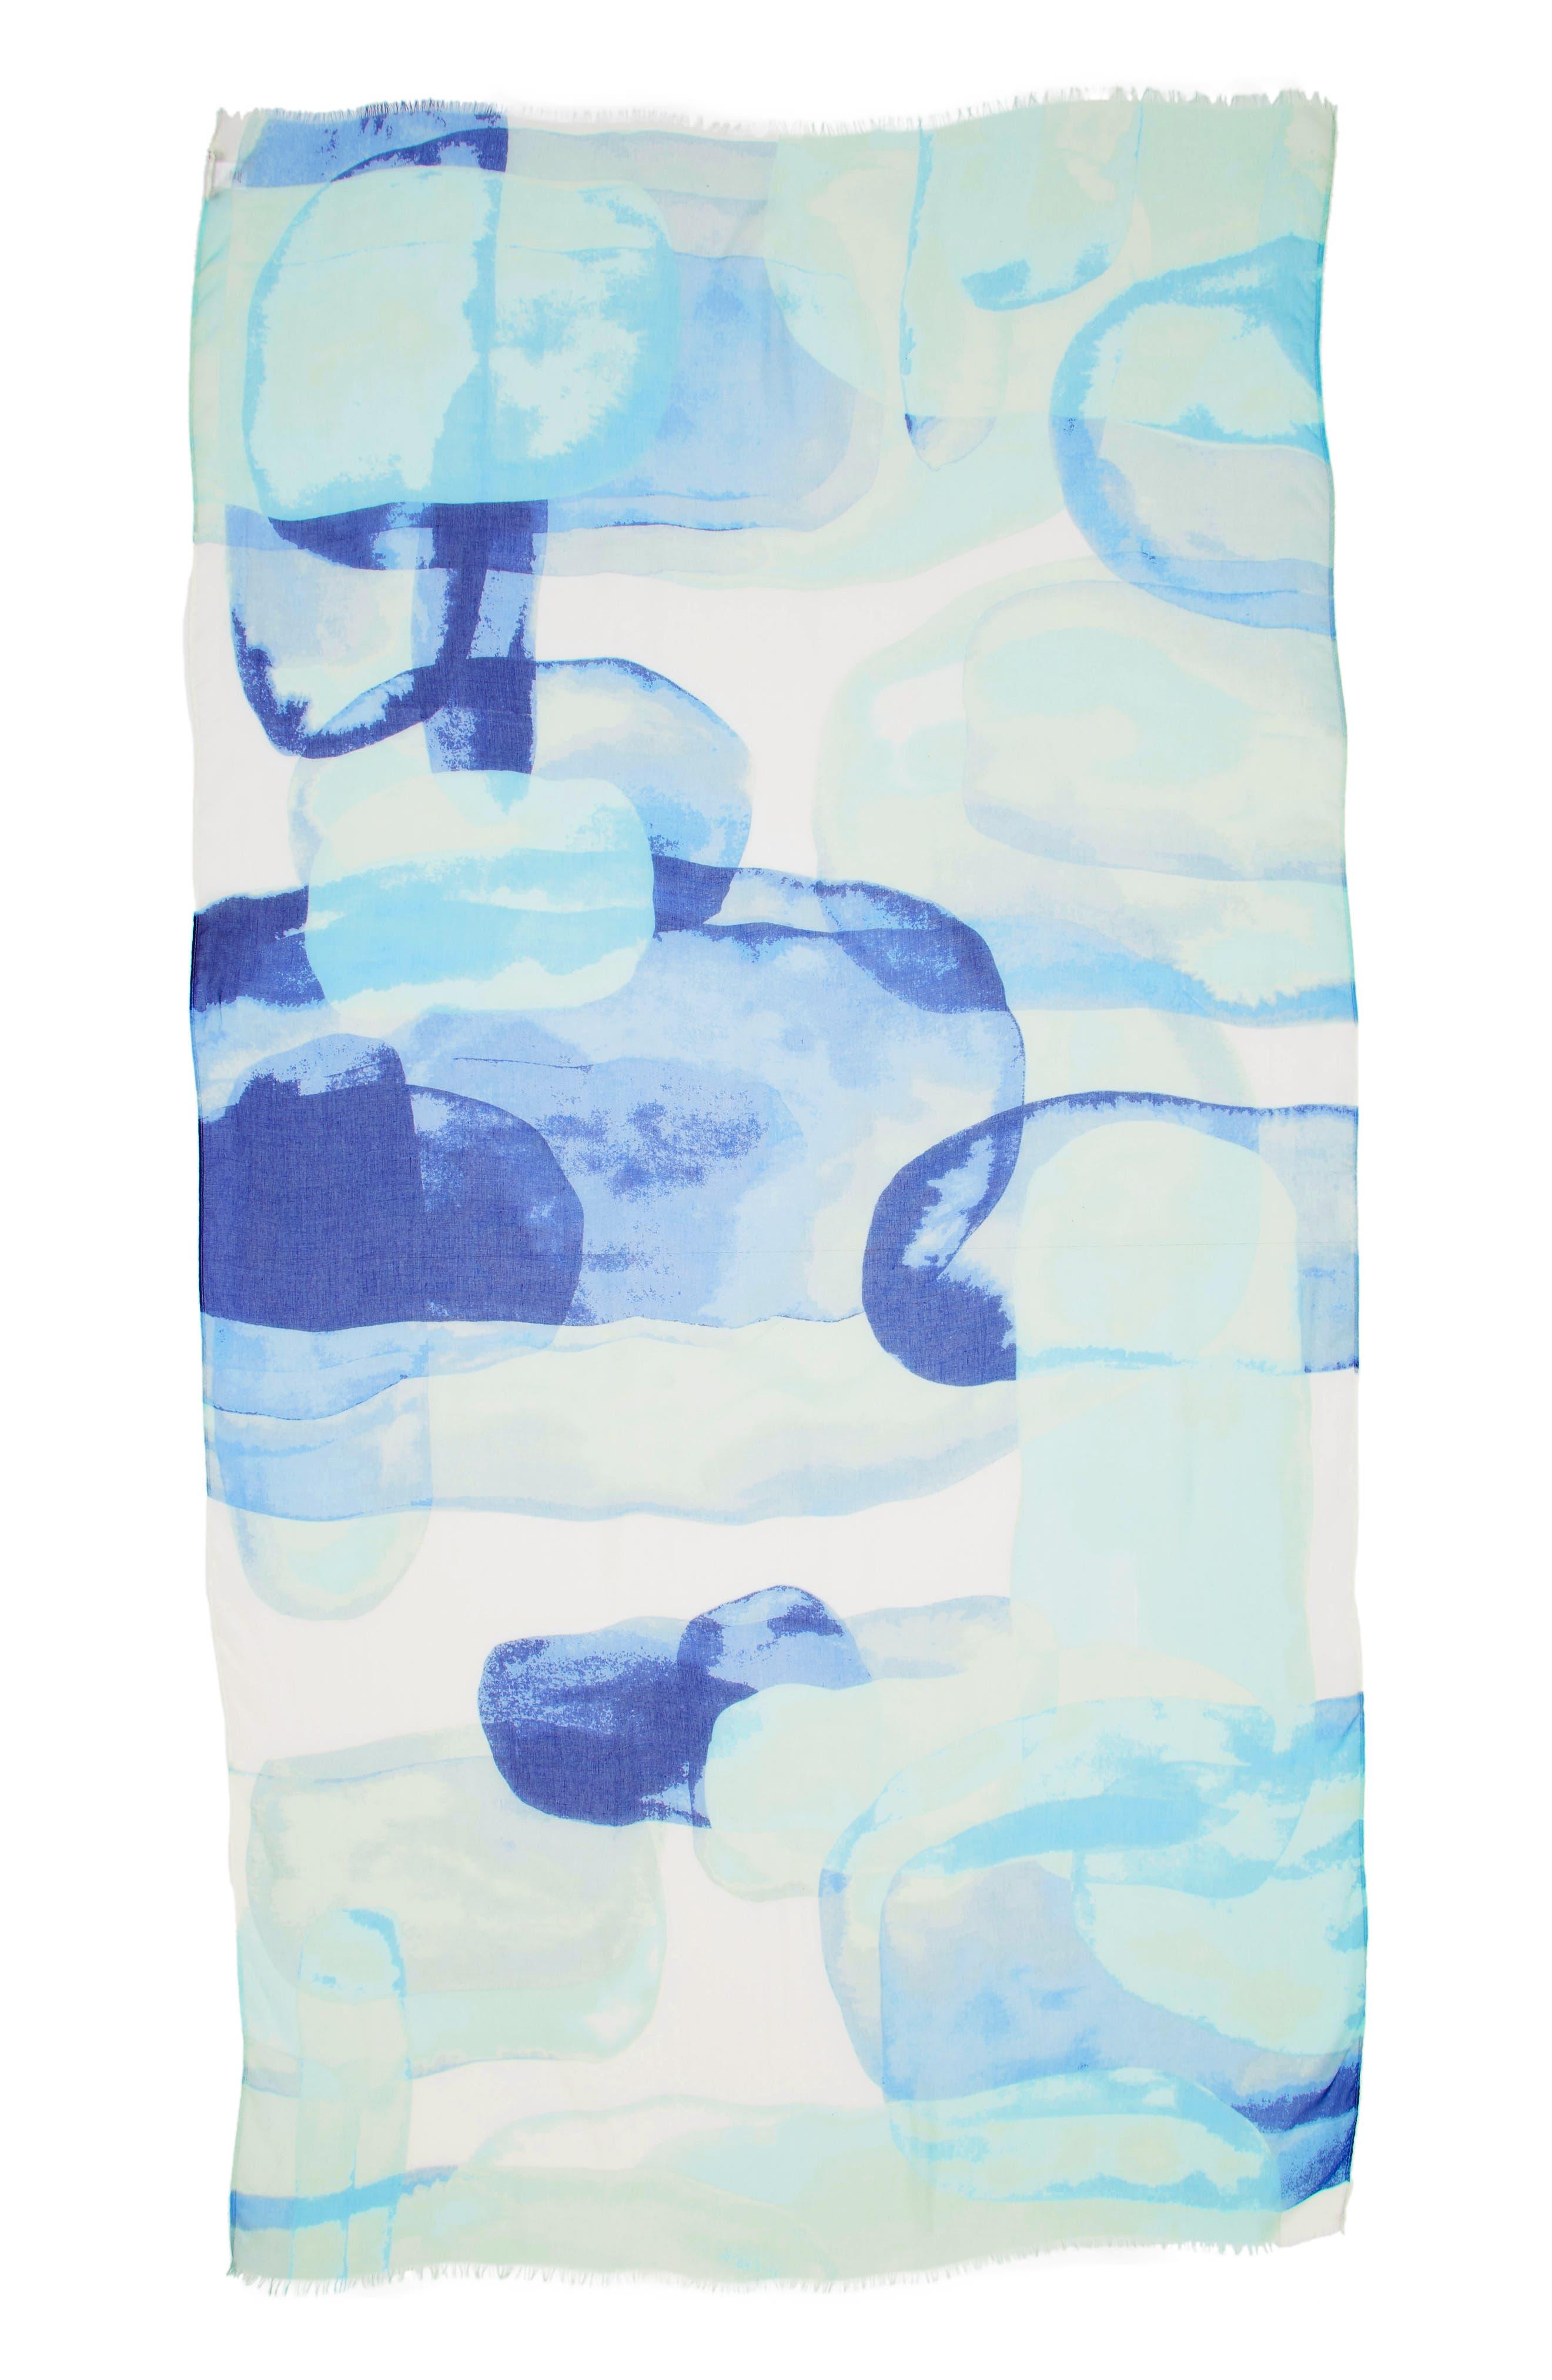 NORDSTROM,                             Print Modal & Silk Scarf,                             Alternate thumbnail 3, color,                             BLUE COLOR STONES